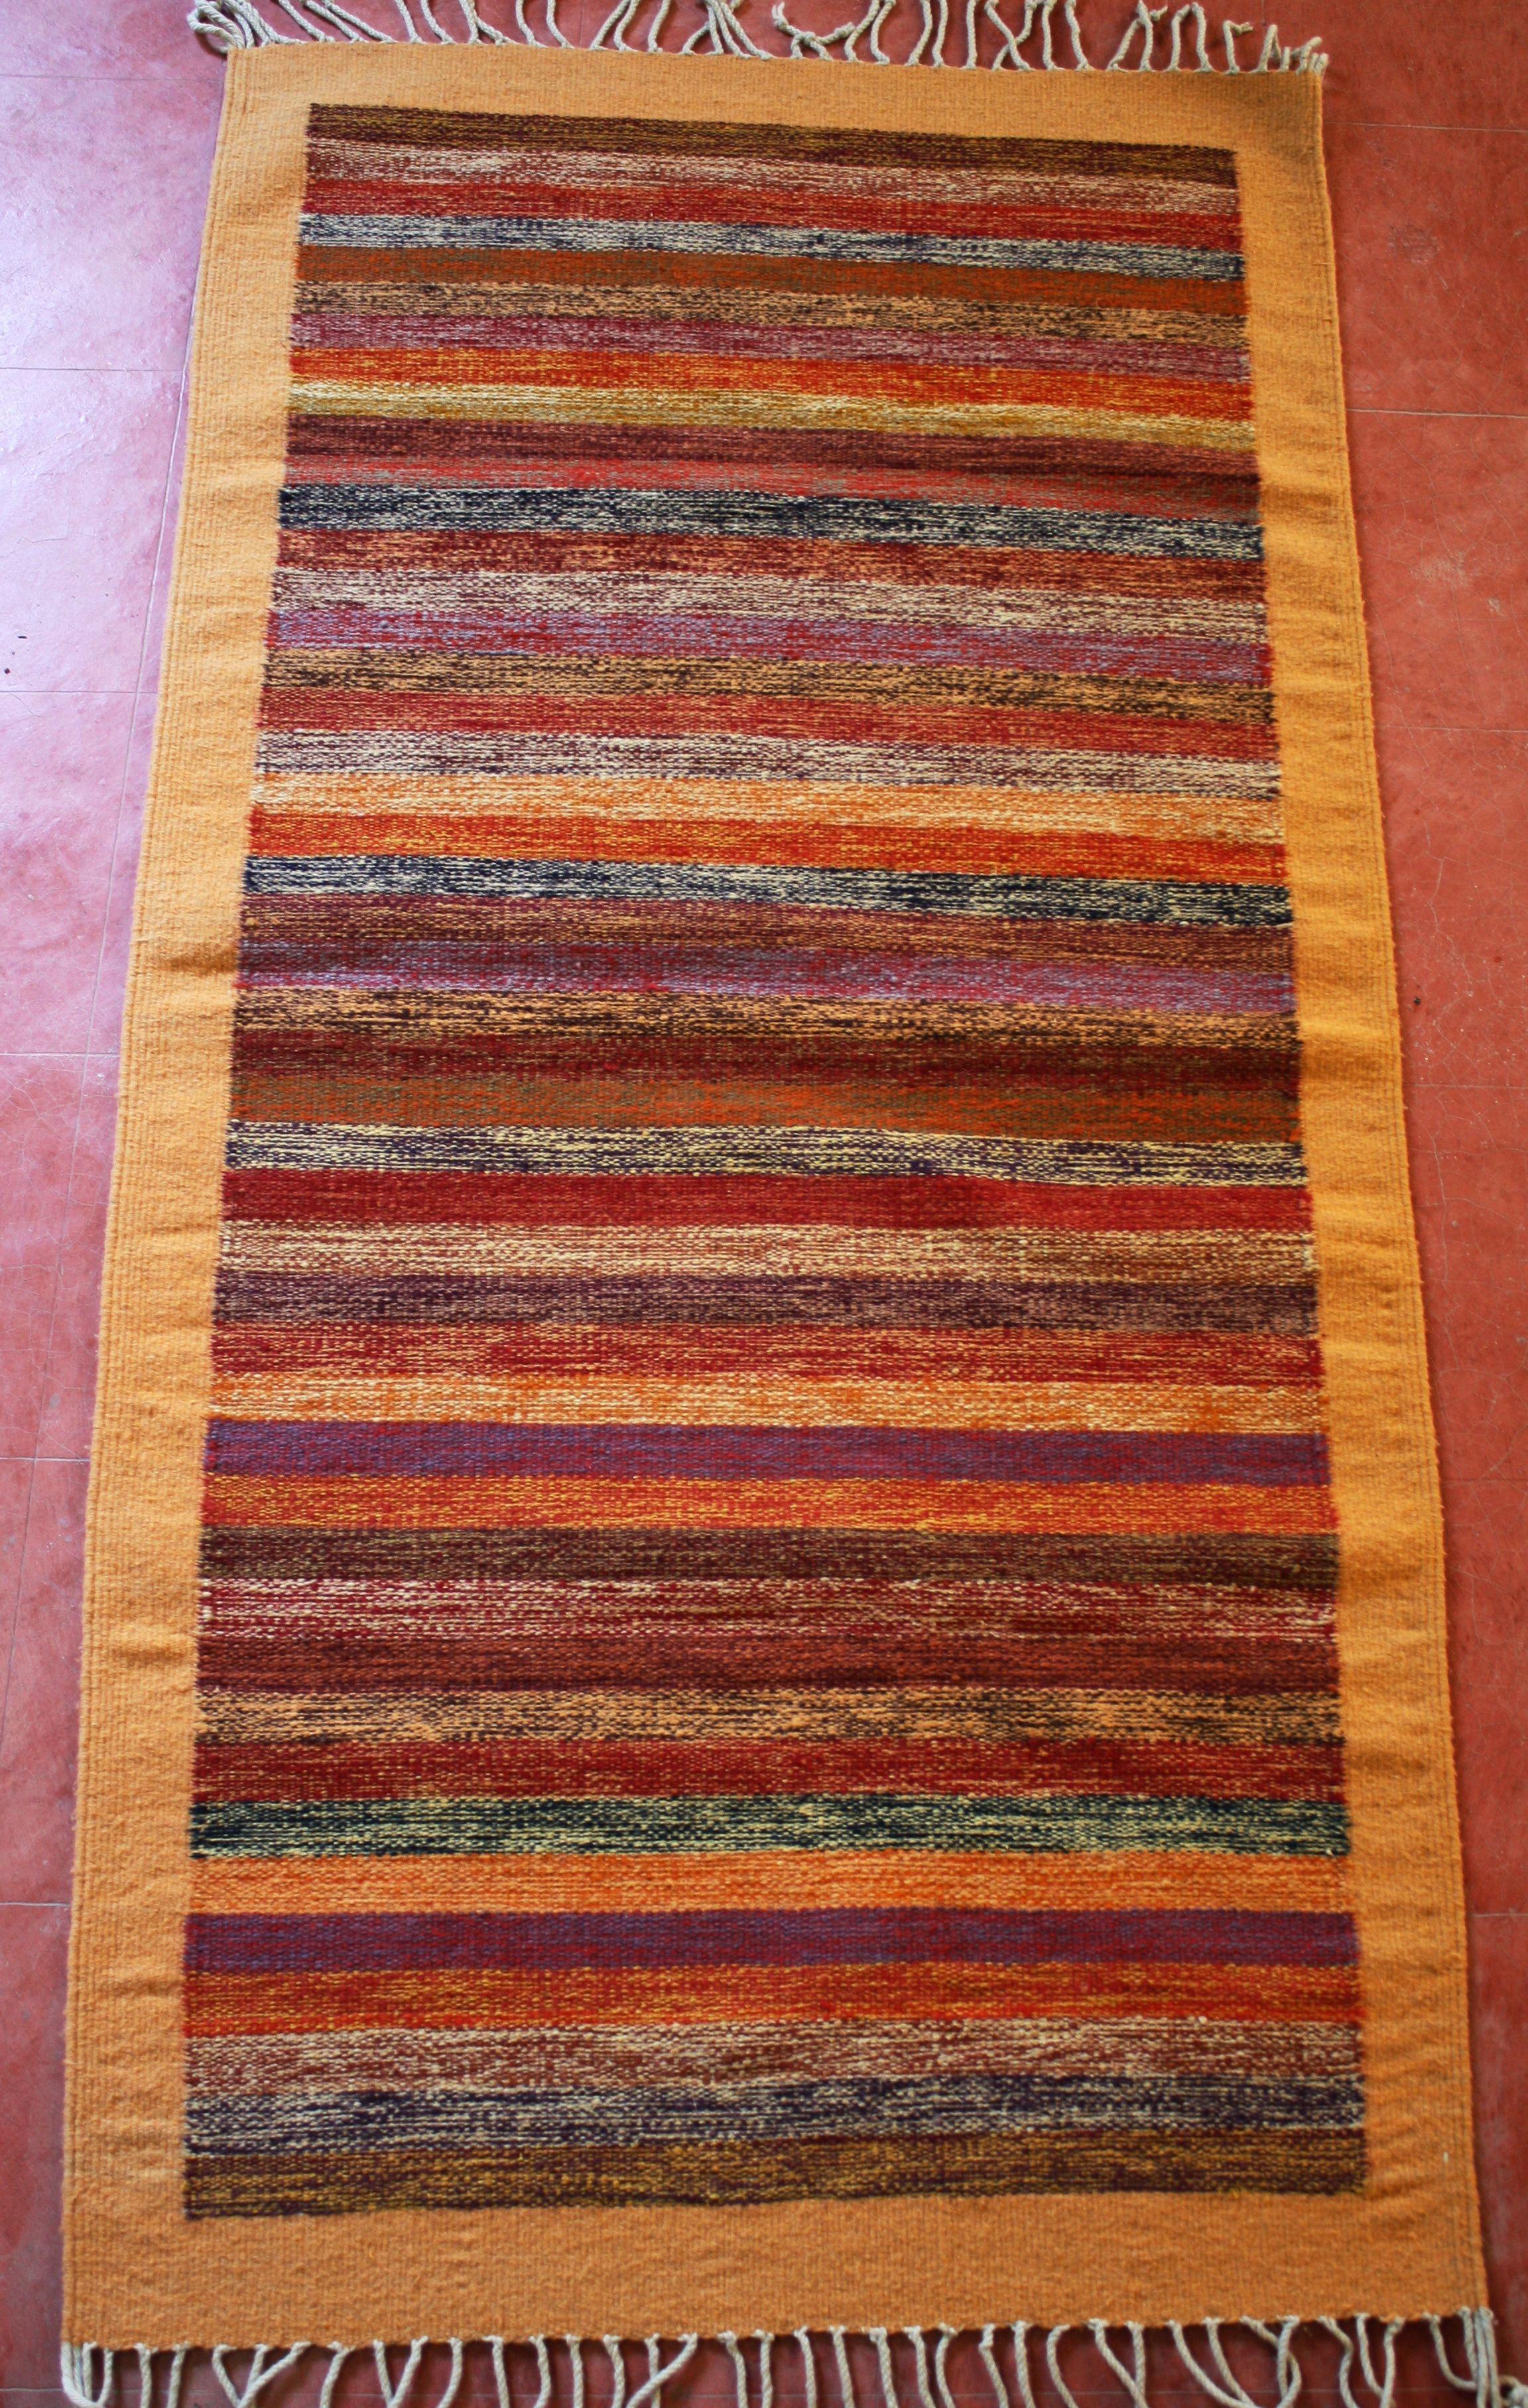 Manos Zapotecas Fair Trade Rug Handwoven By Leticia Lazo With